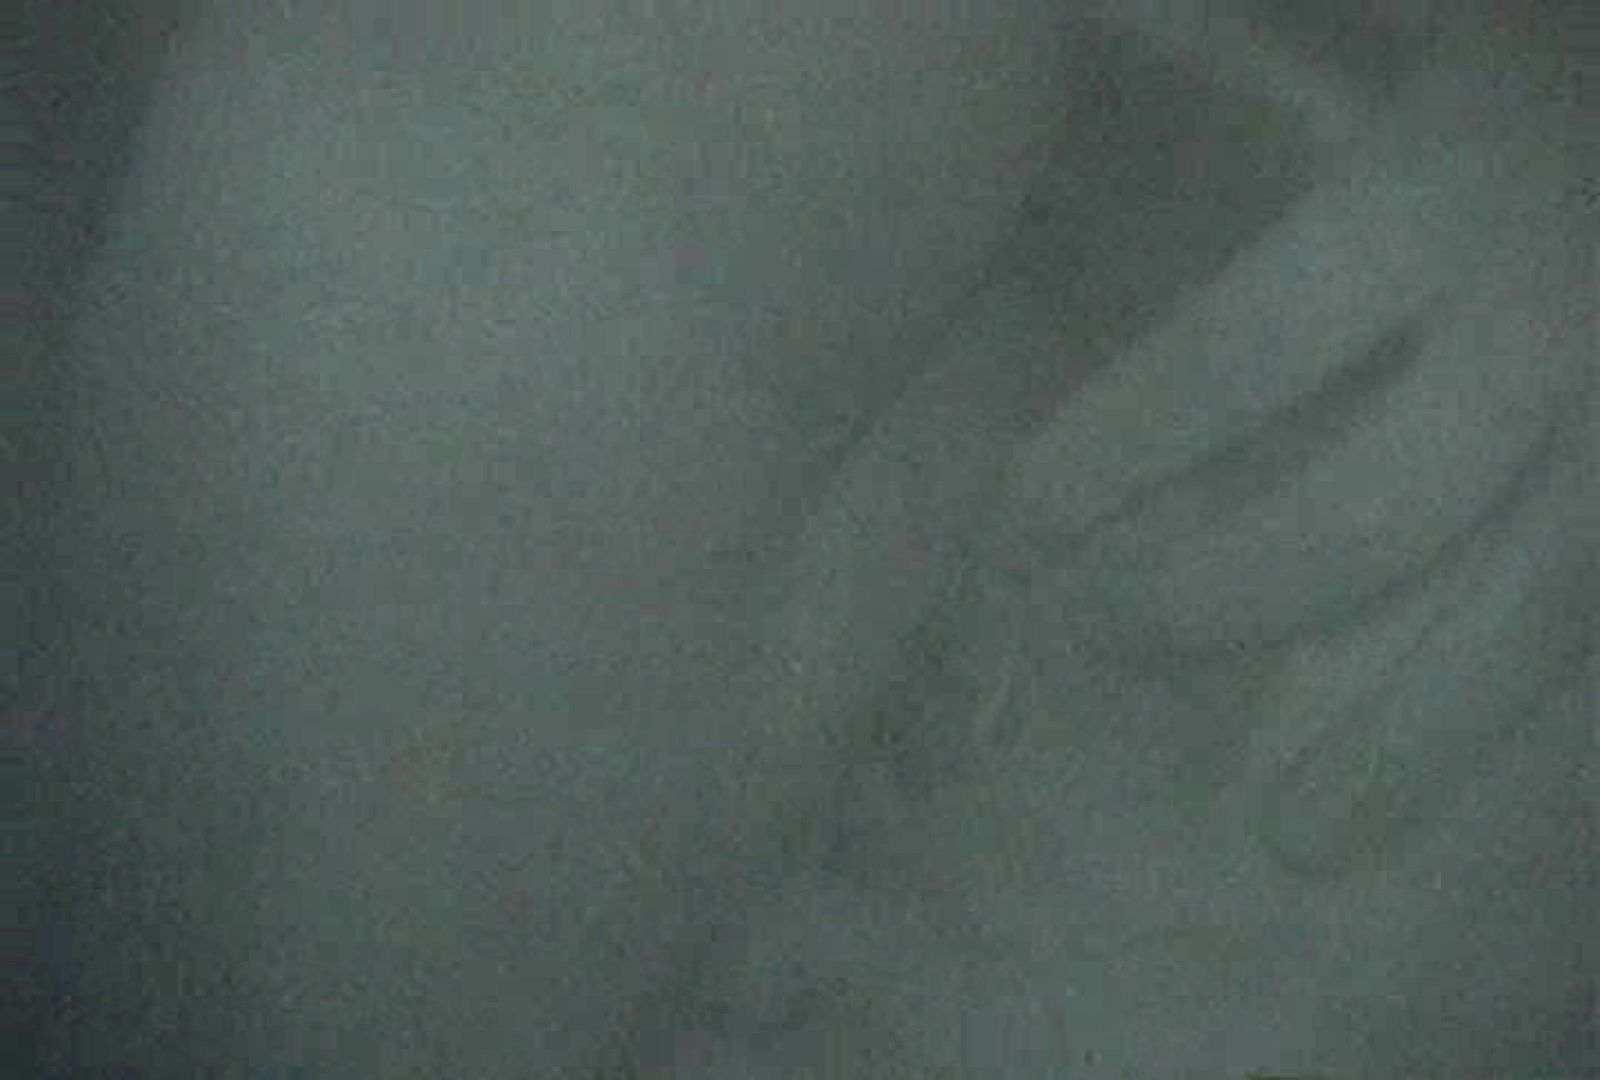 充血監督の深夜の運動会Vol.47 OLヌード天国 SEX無修正画像 70PIX 5